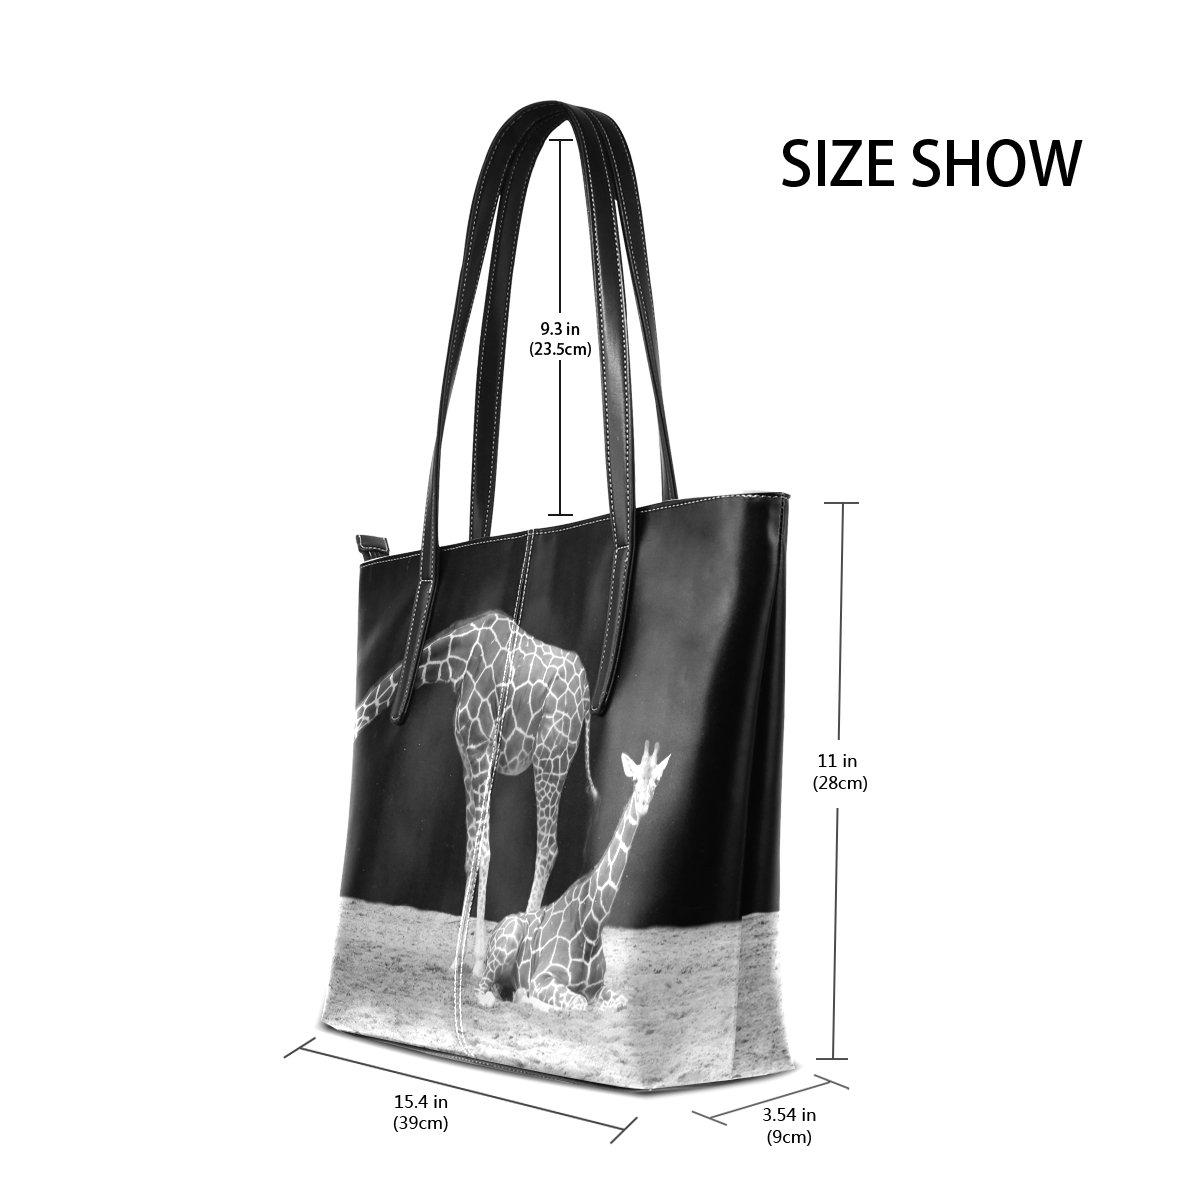 c373fd93e76f DEYYA Women's Vintage Giraffe Animal PU Leather Tote Shoulder Bag ...